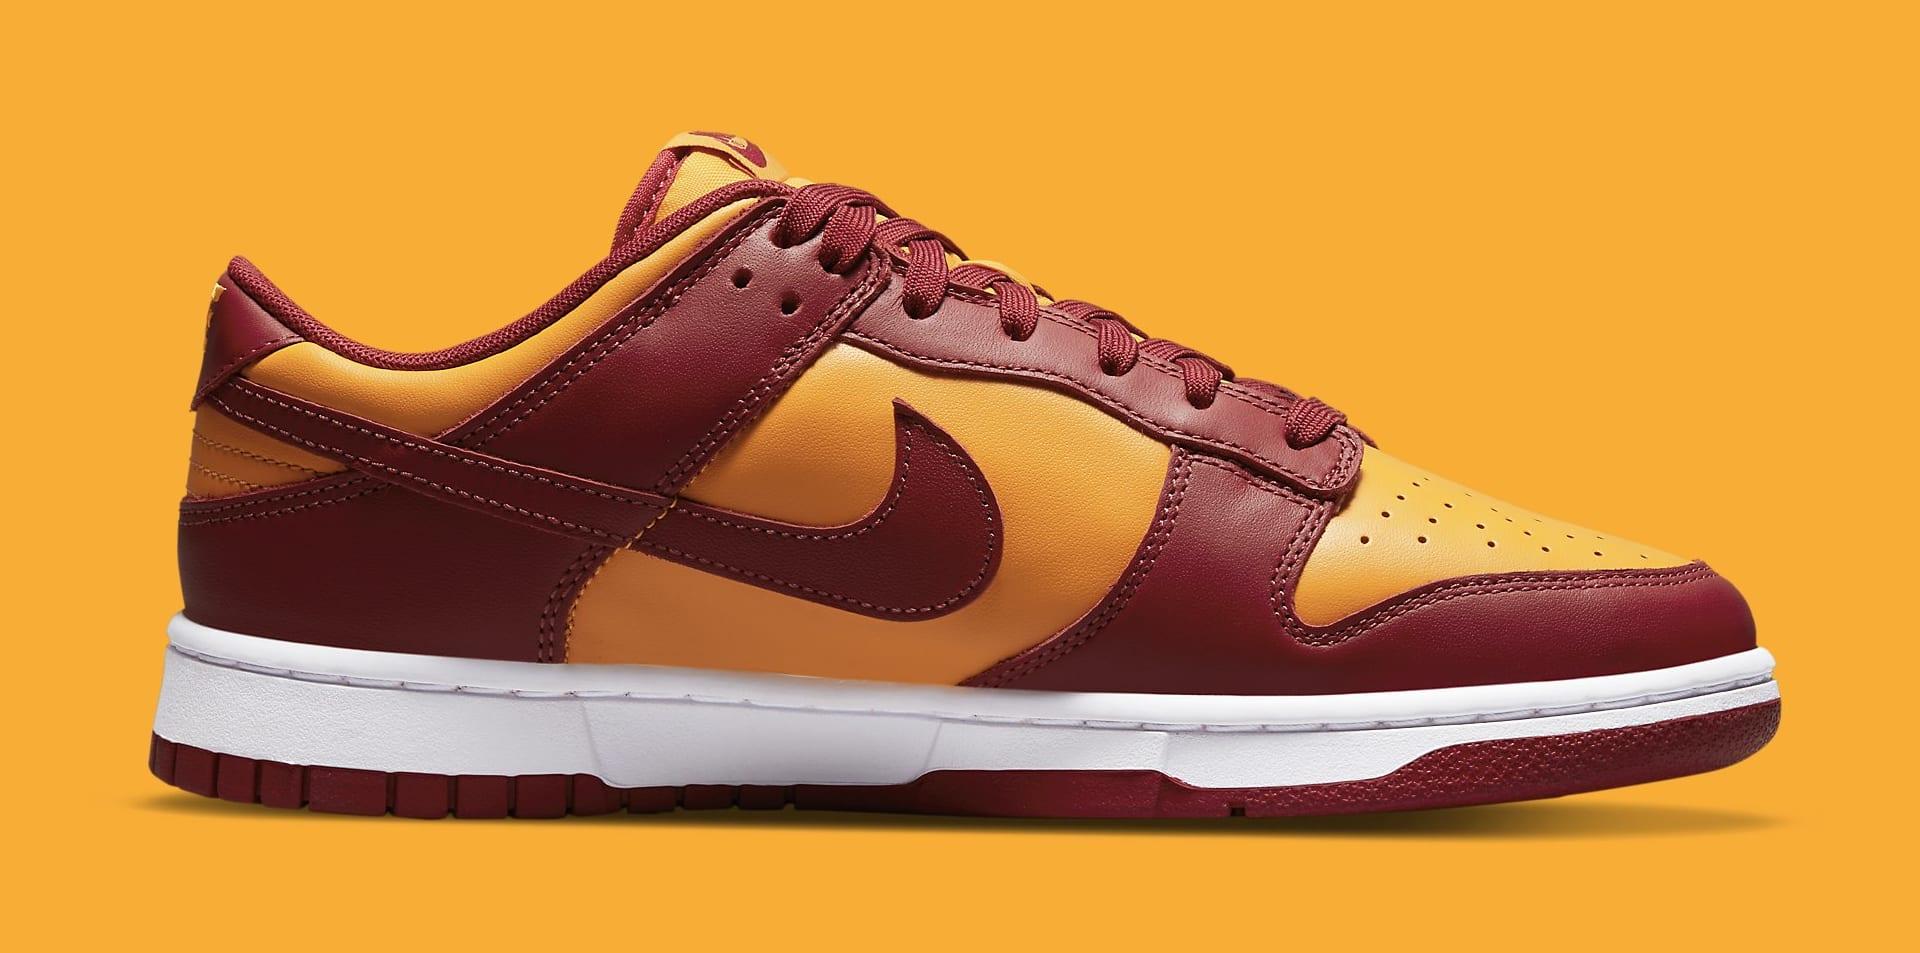 Nike Dunk Low 'Midas Gold' DD1391-701 Medial